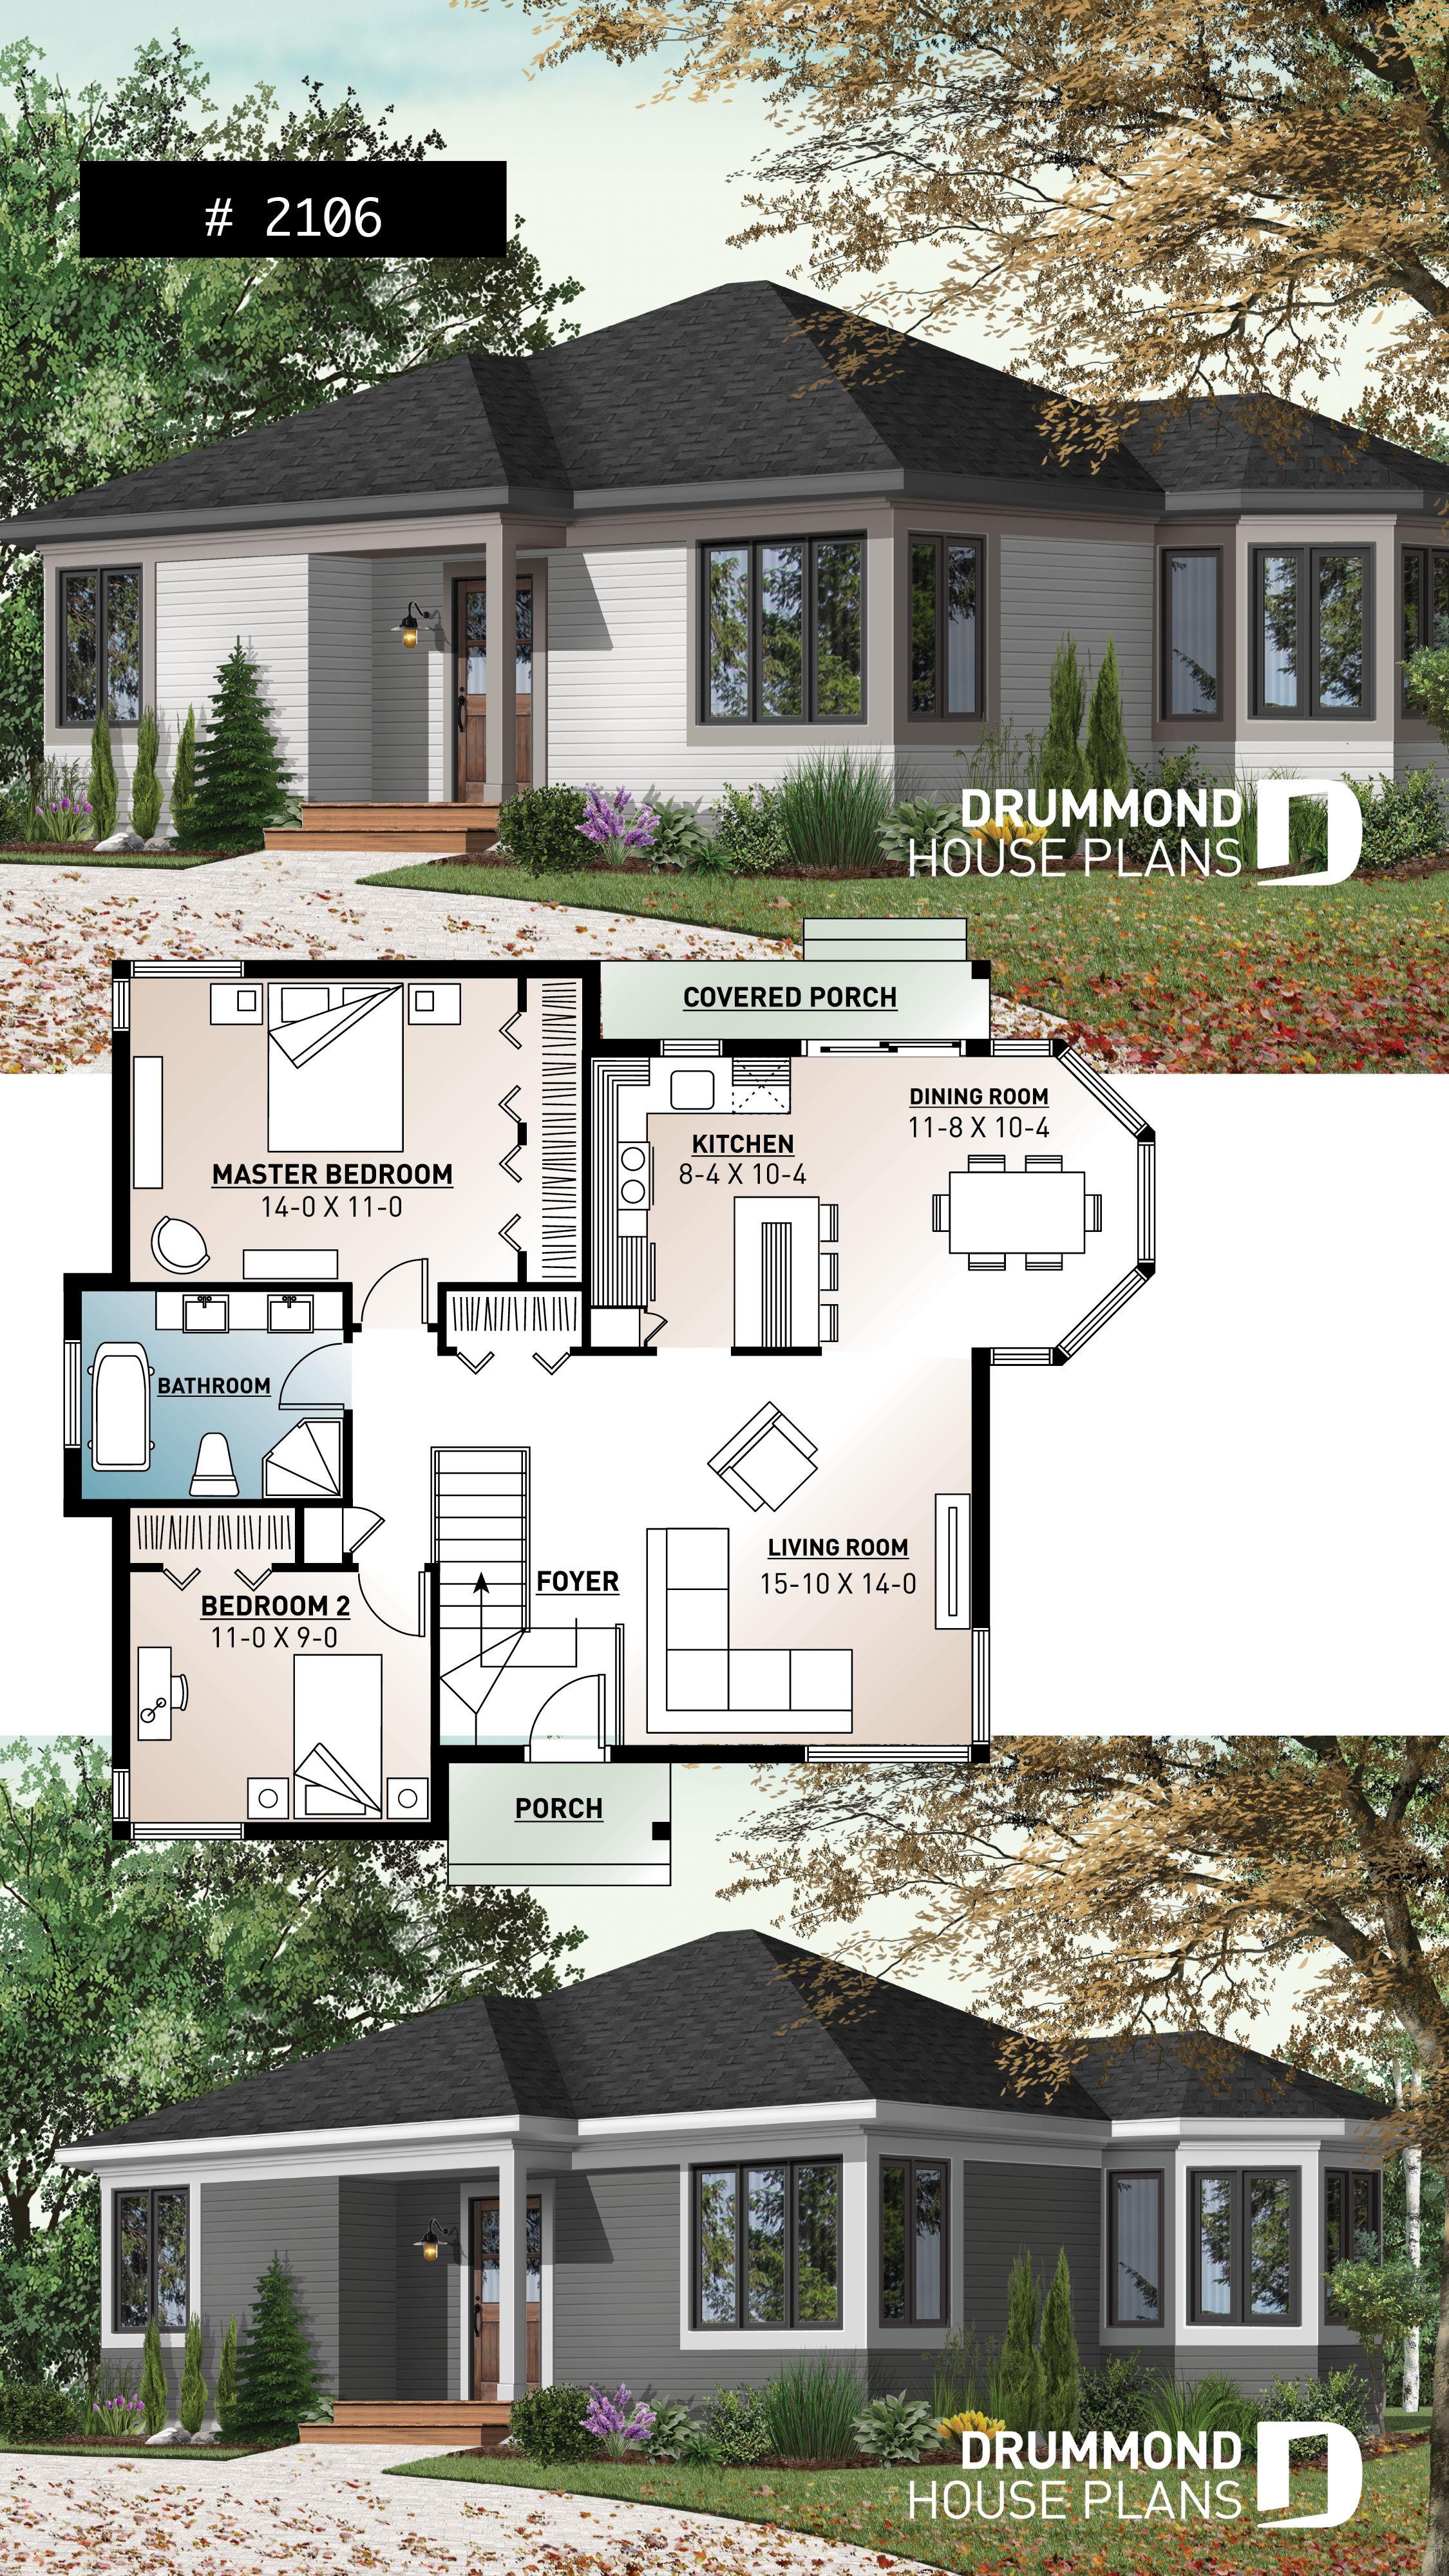 House Plan Bartholdi No 2106 New House Plans Traditional House